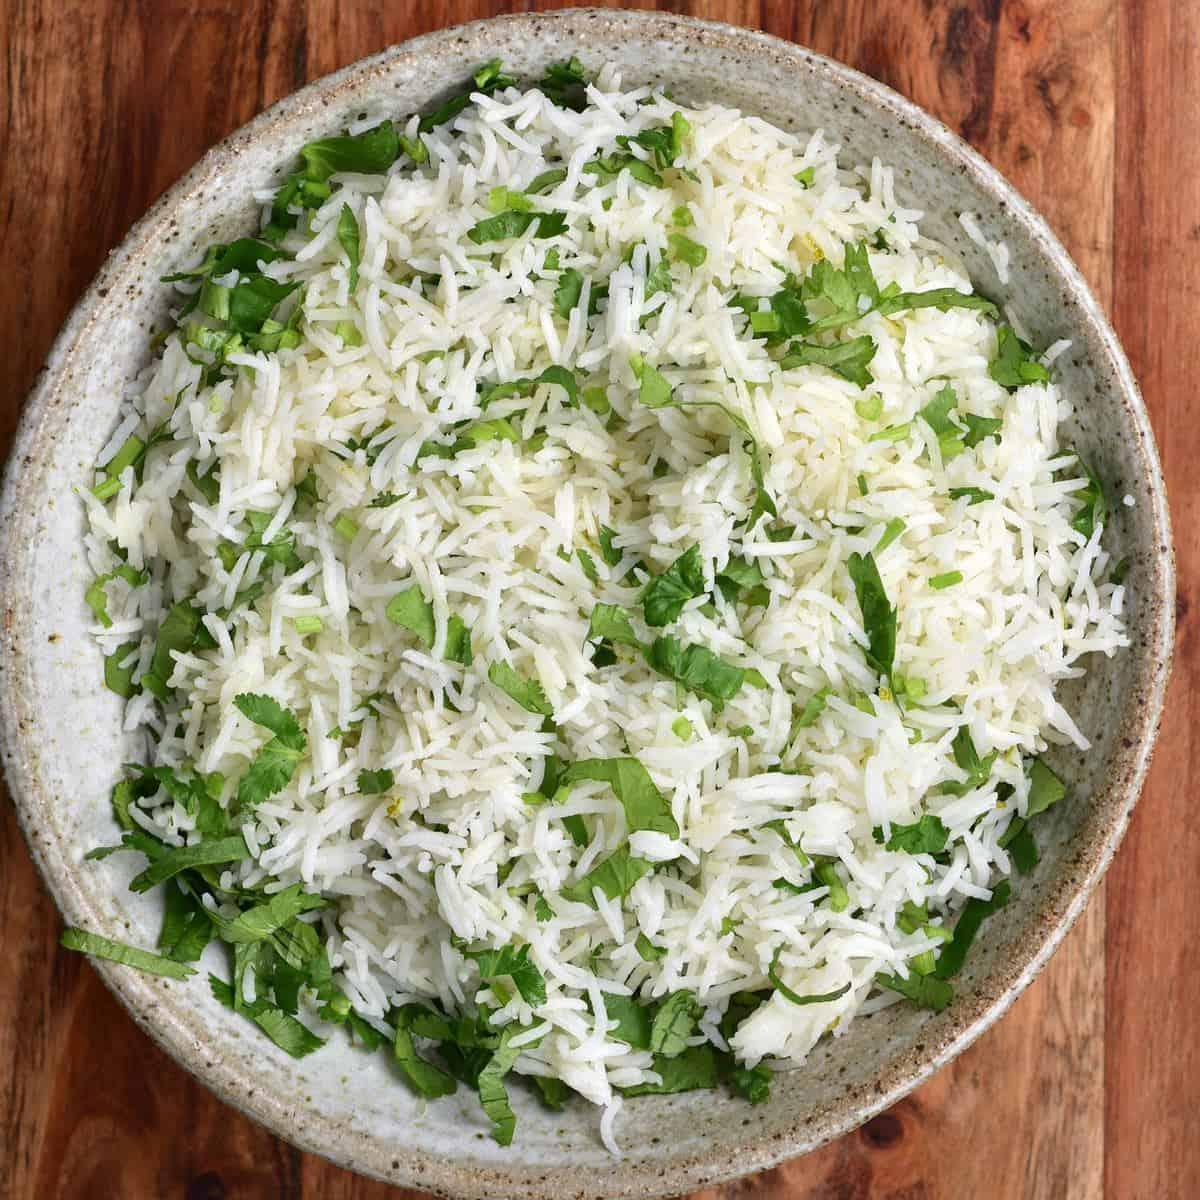 A bowl of basmati rice mixed with cilantro